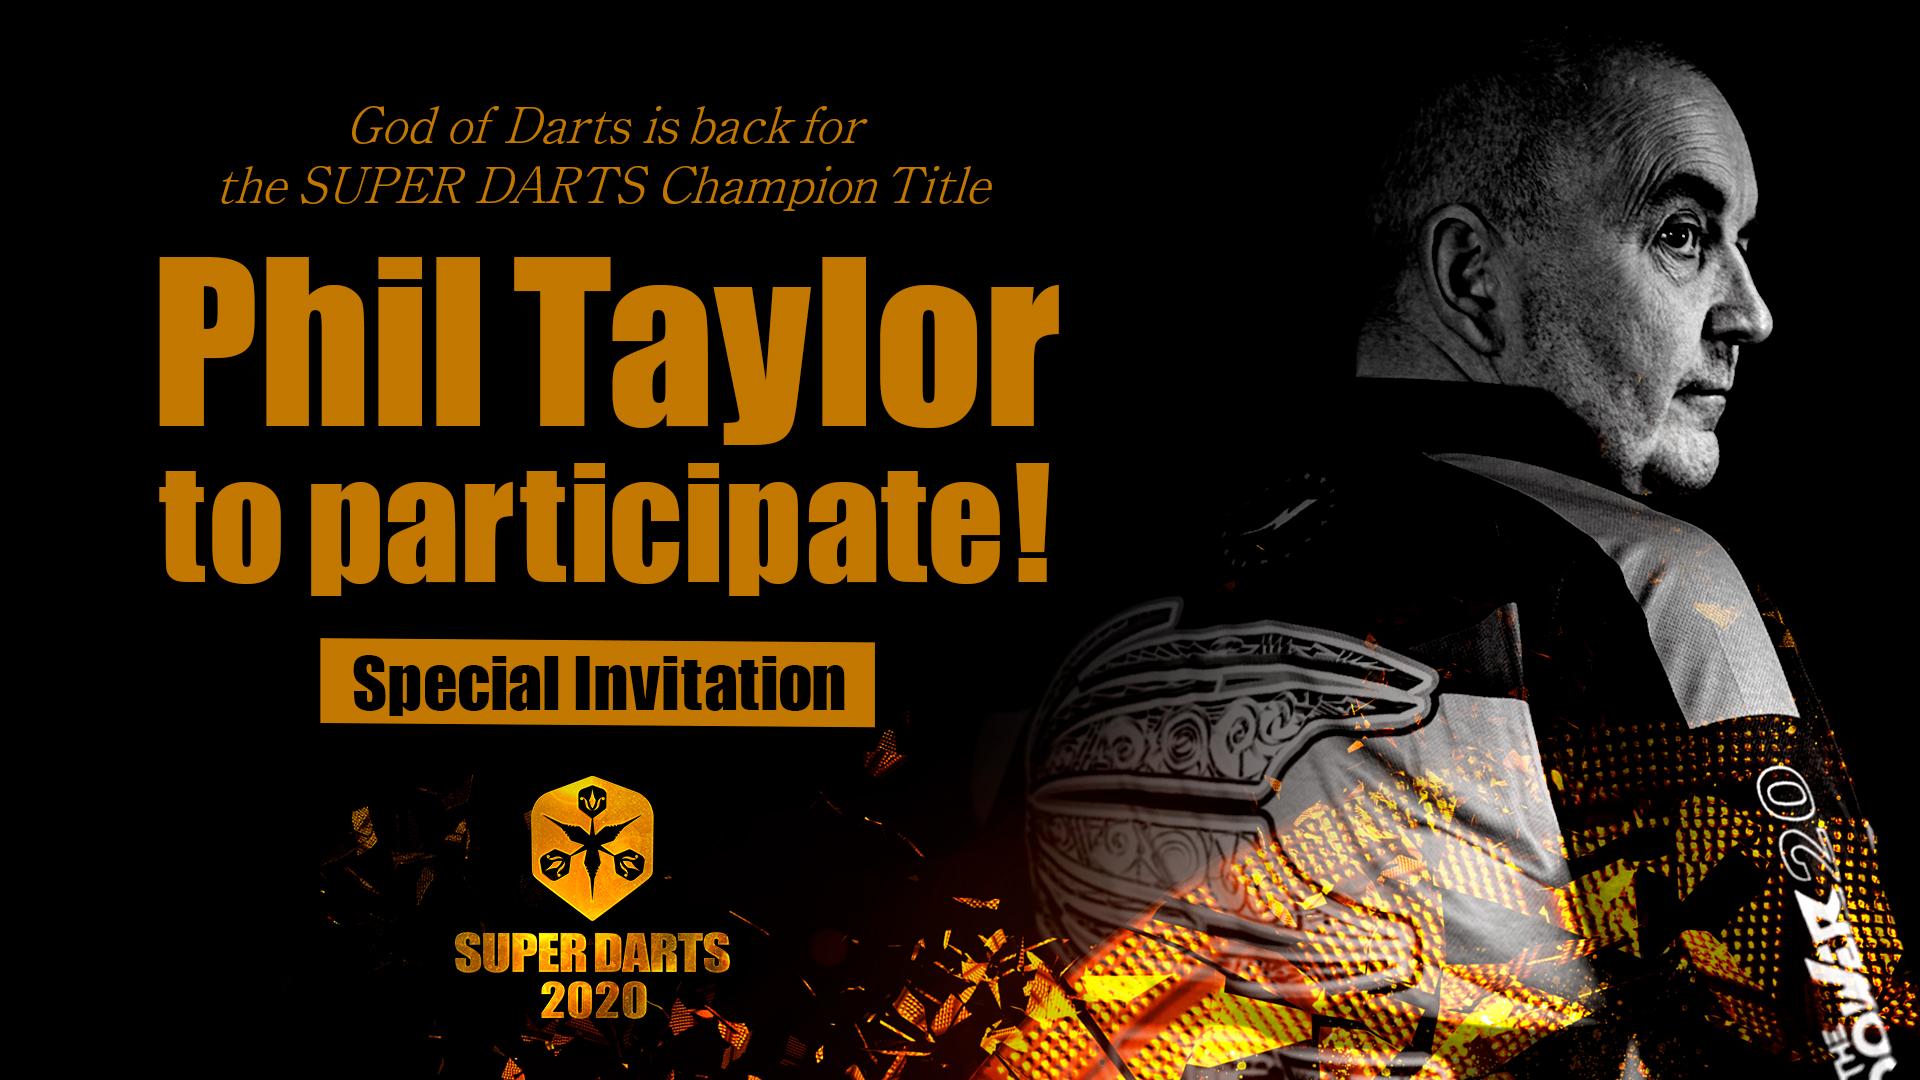 【Special Invitation】Phil Taylor to participate!